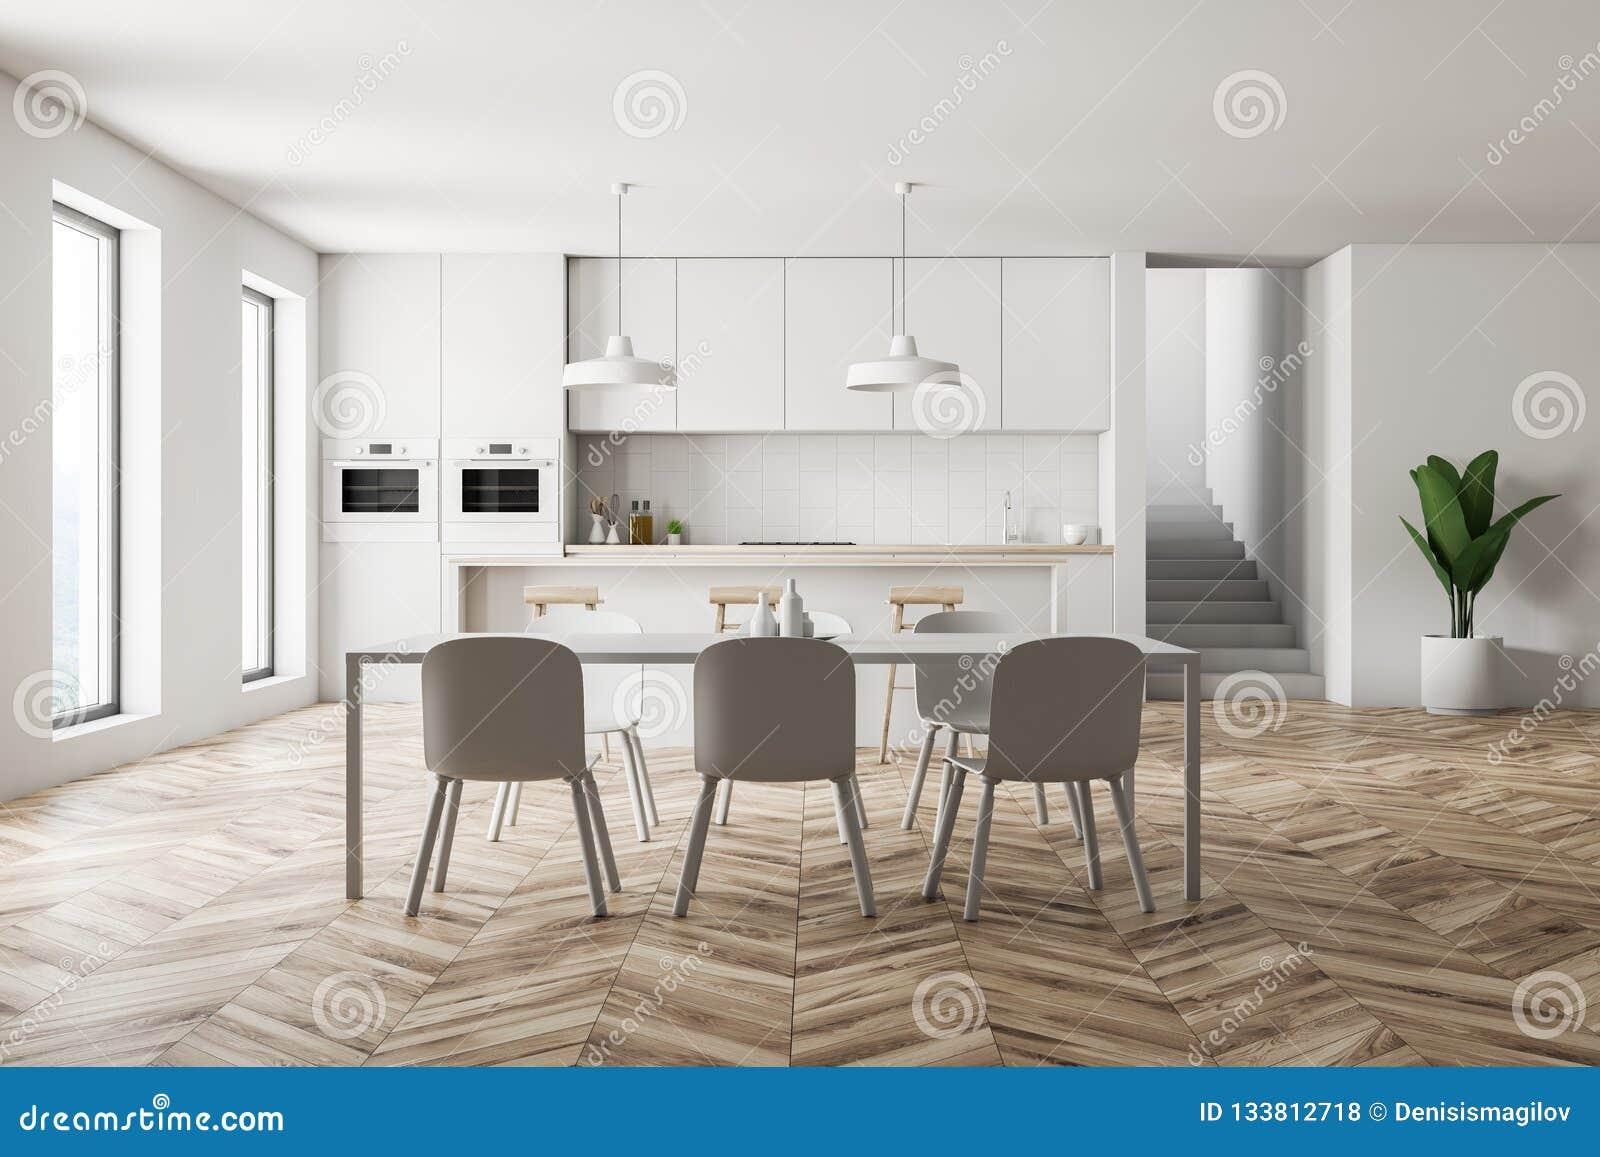 White Kitchen Interior, Bar And Table Stock Illustration ...